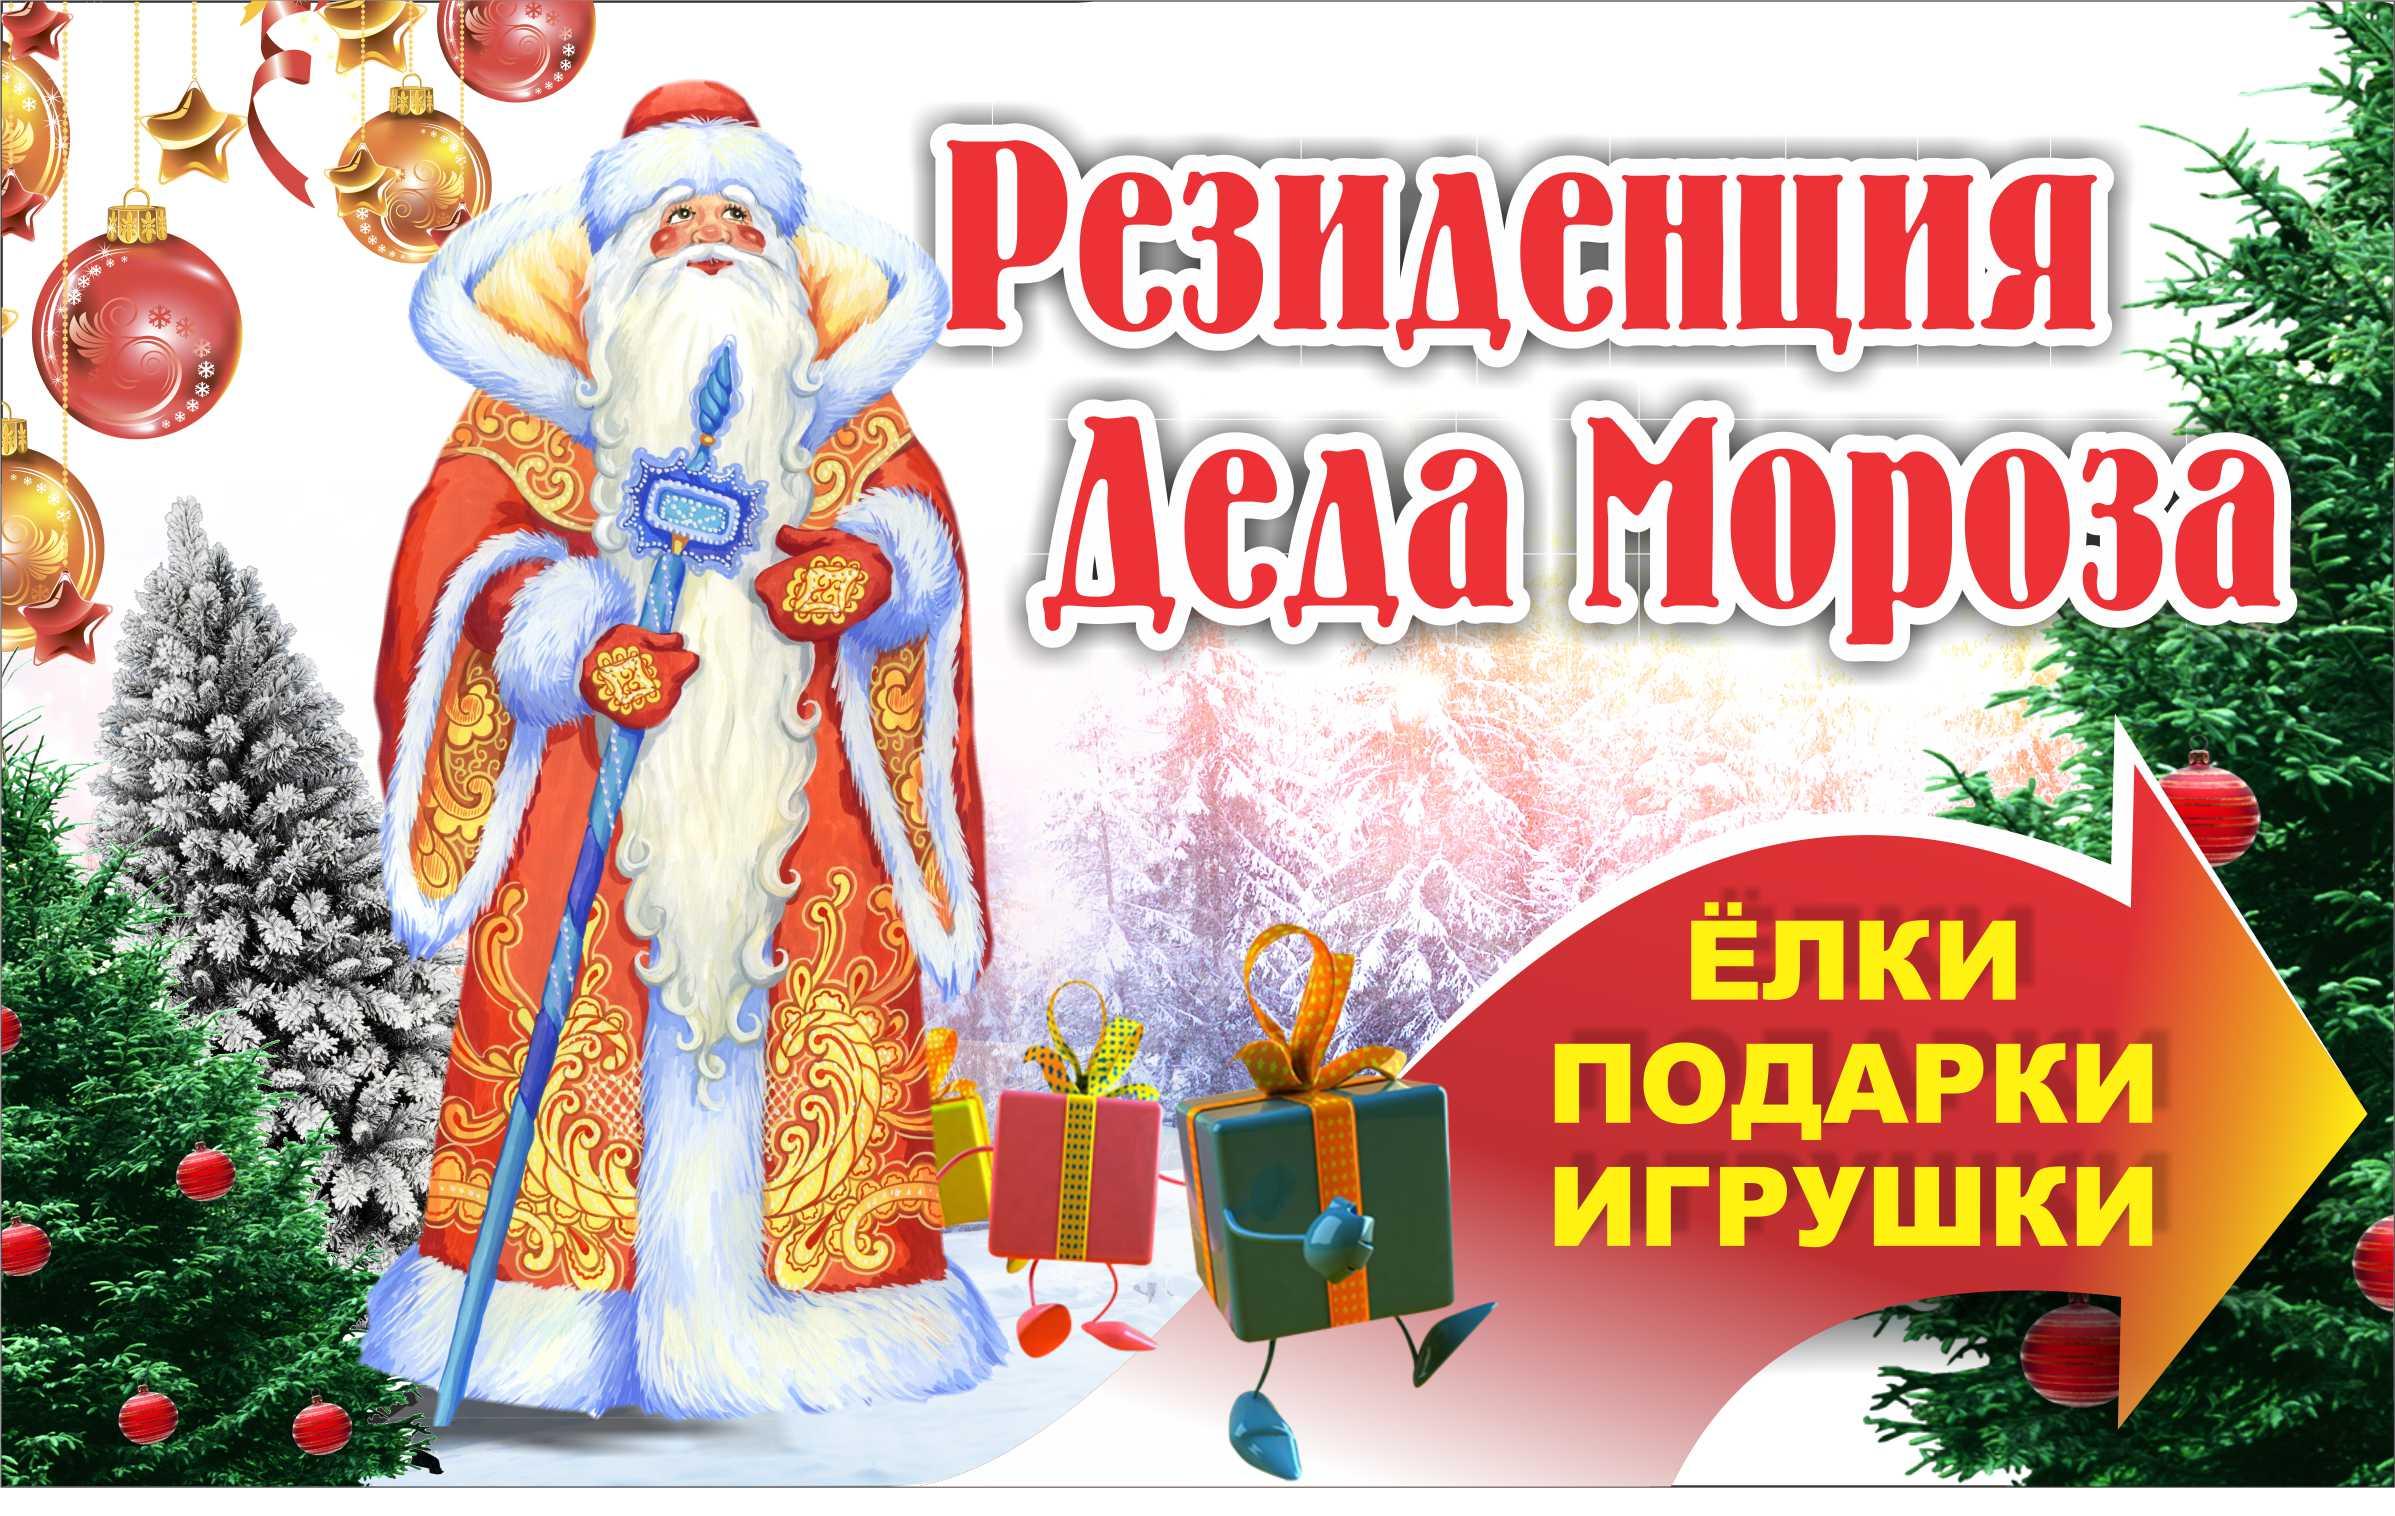 3-4 декабря резиденция Деда Мороза в ТРЦ Седанка-Сити!